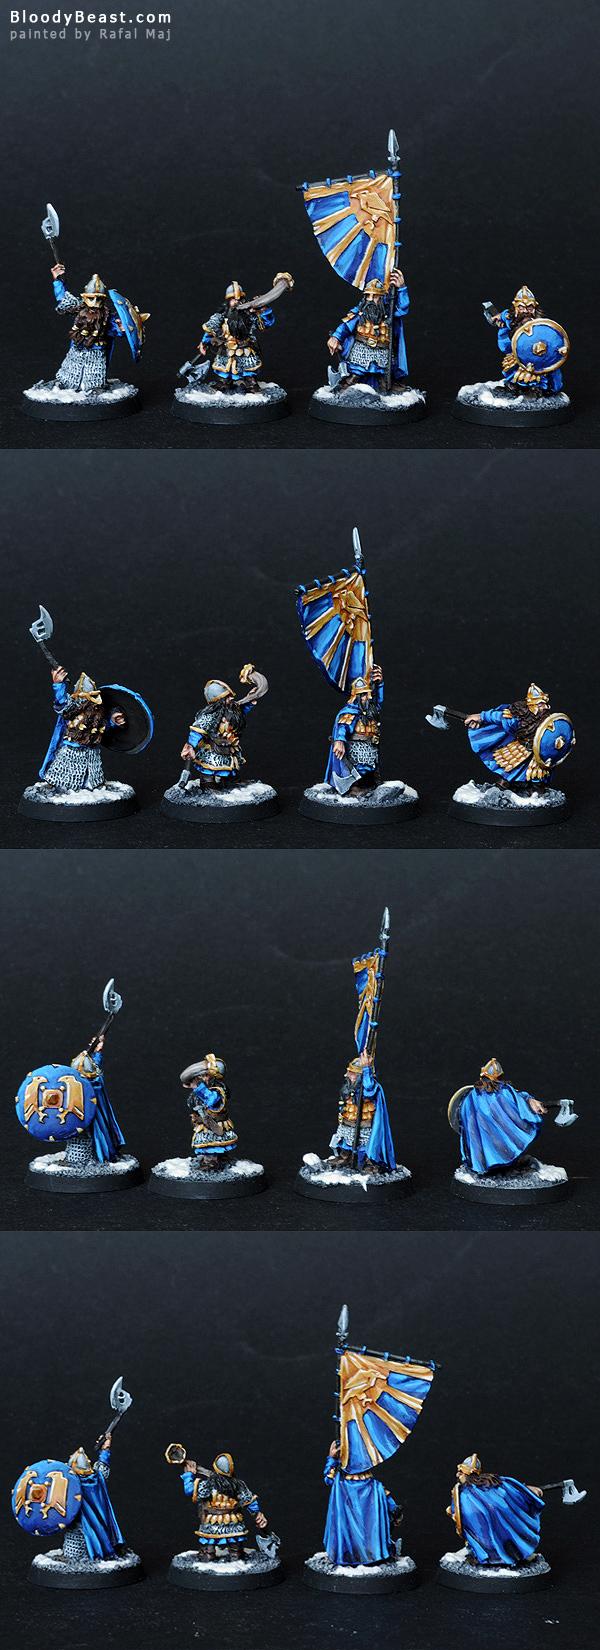 Dwarf Commanders painted by Rafal Maj (BloodyBeast.com)